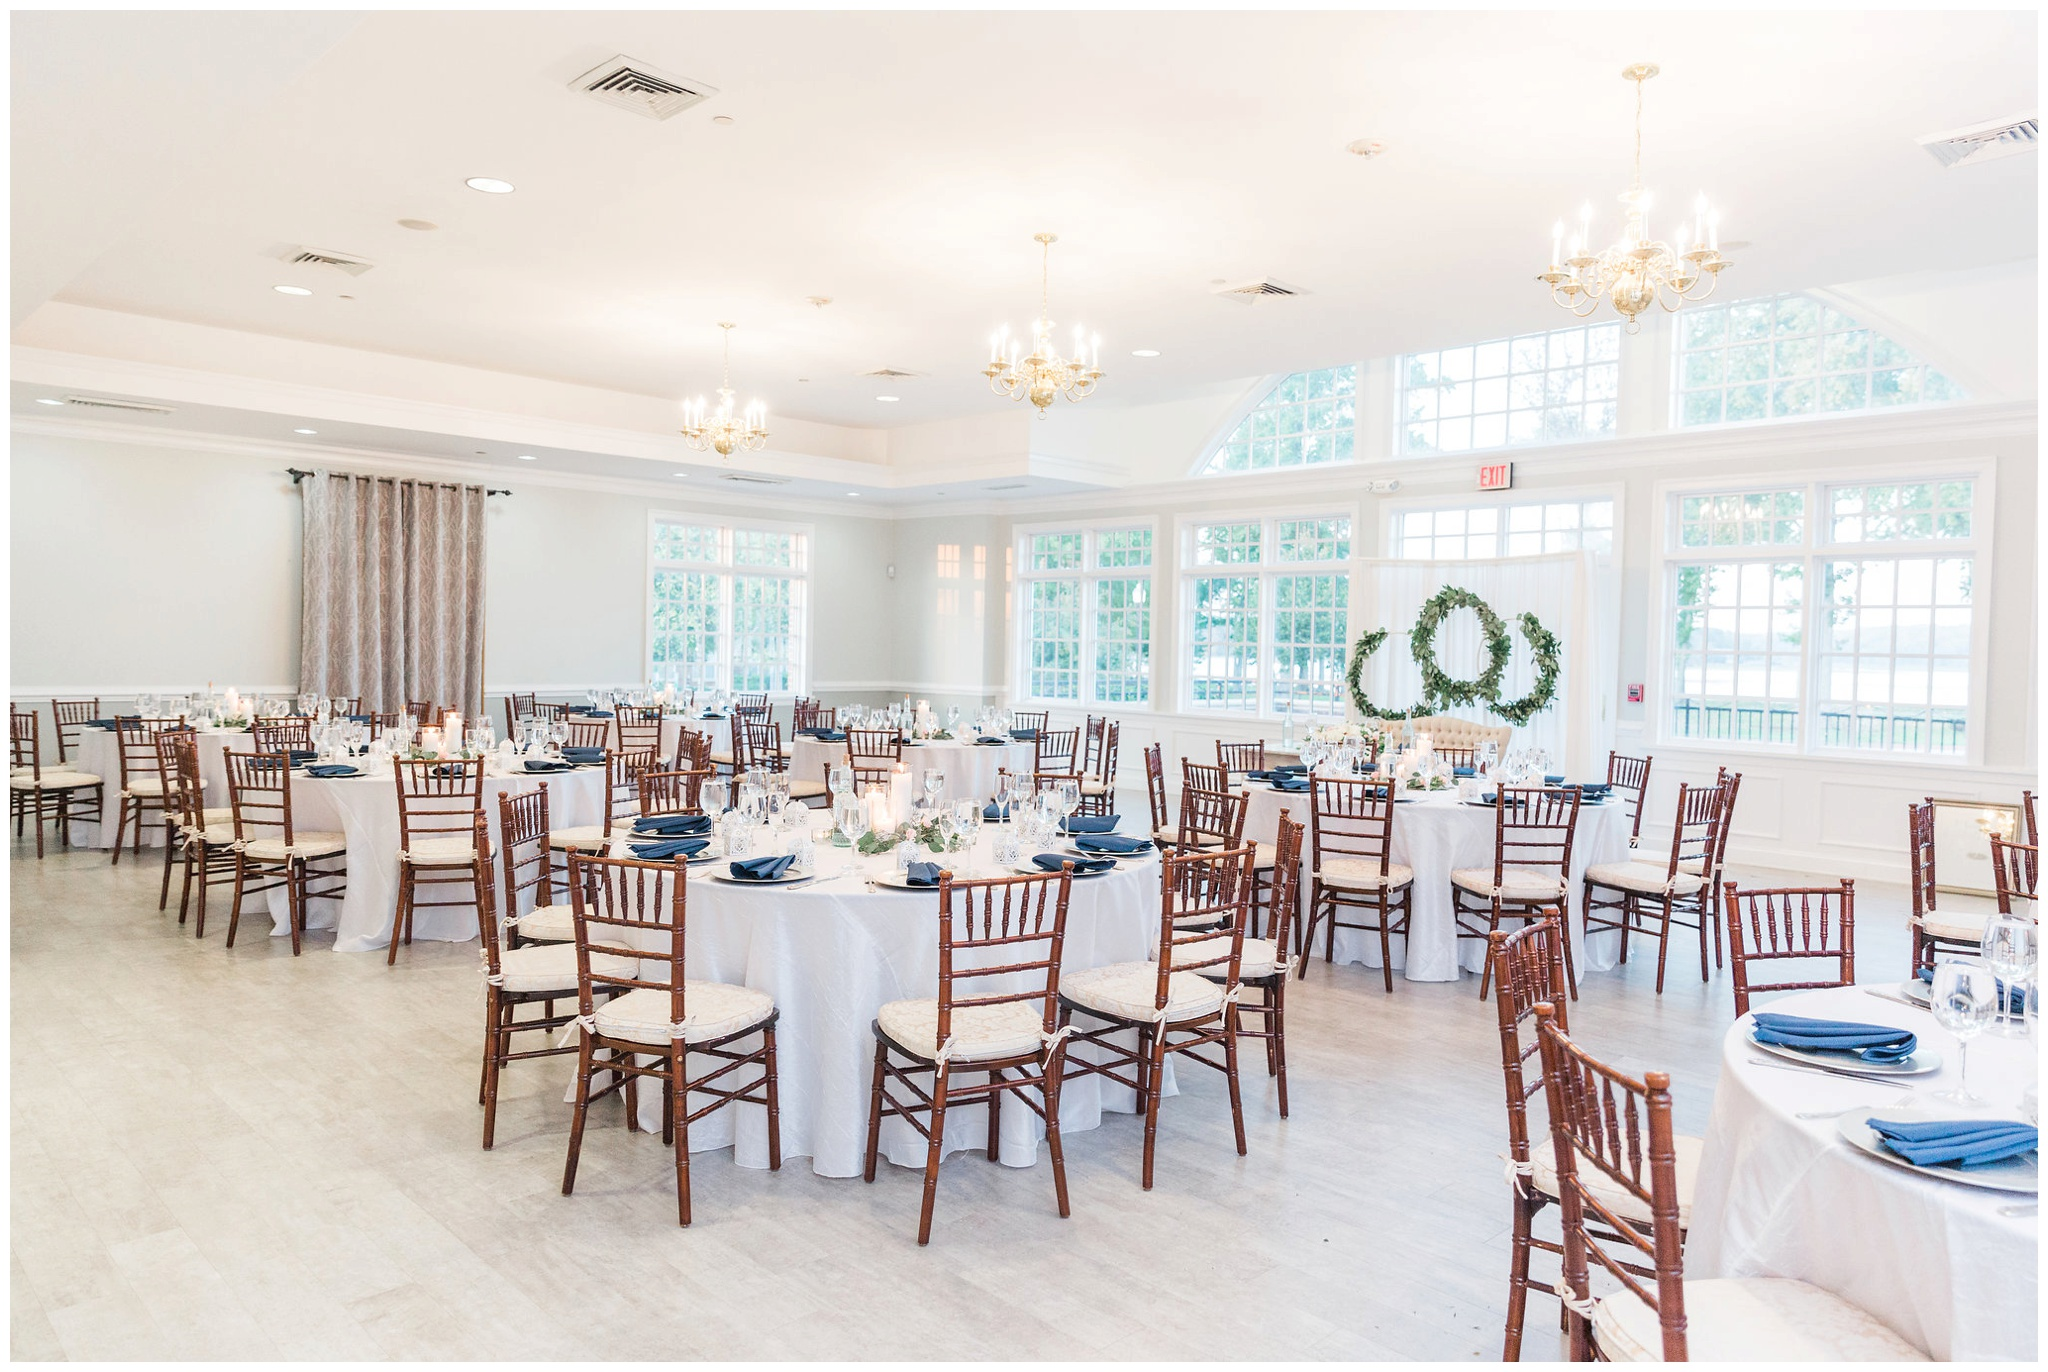 Best Wedding Venues in Northern Virginia, The Osprey's at Belmont Bay Wedding